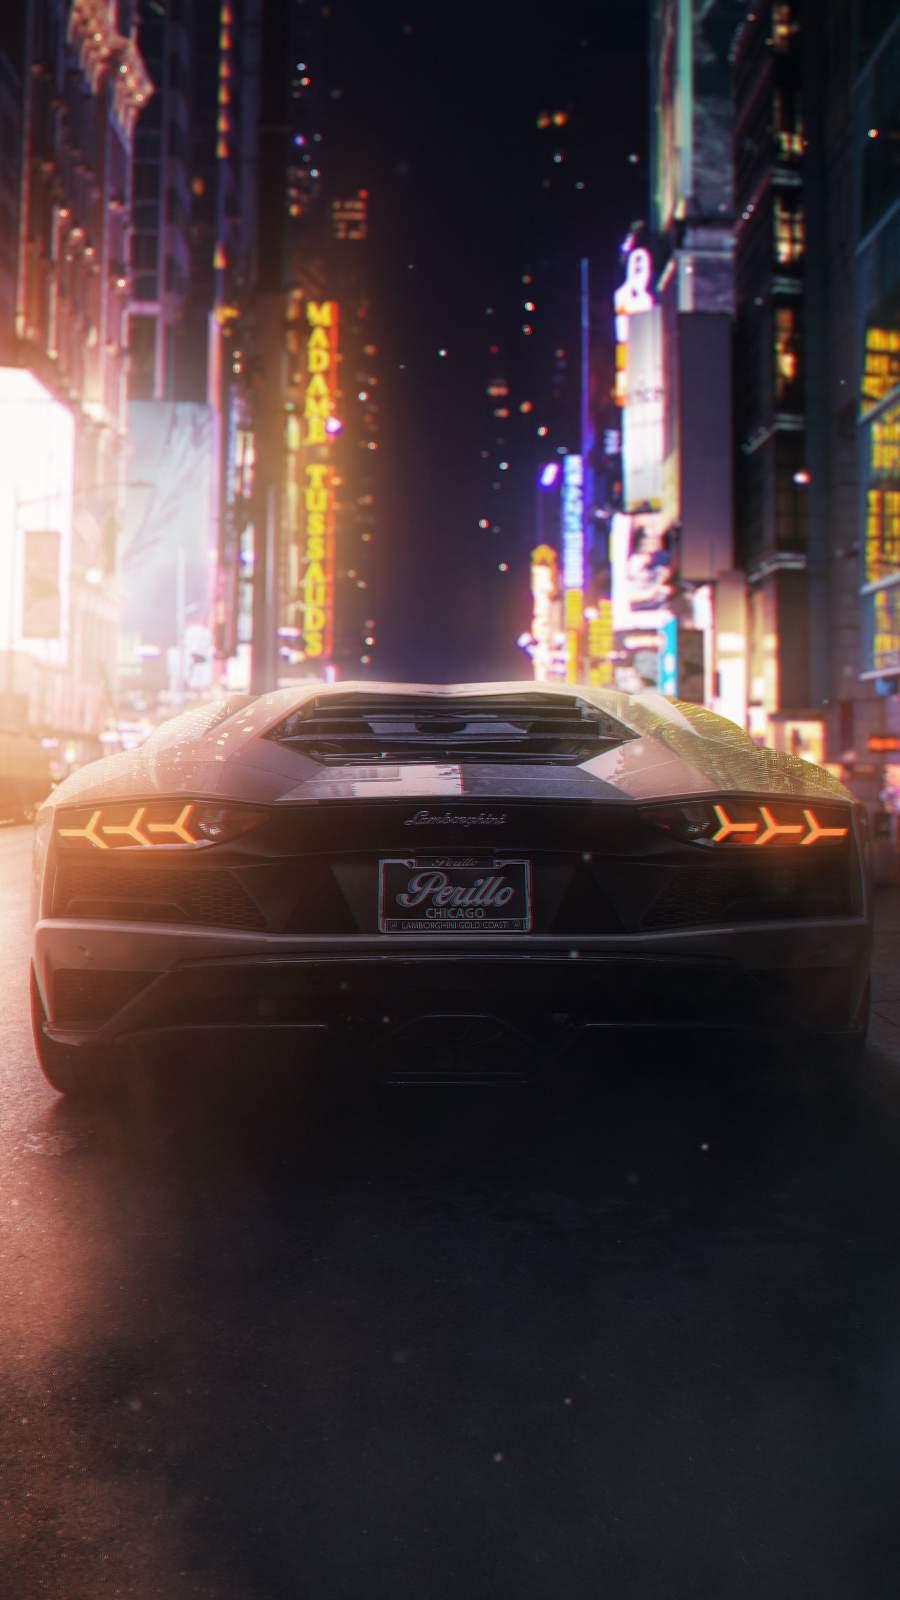 Lamborghini in Night iPhone Wallpaper